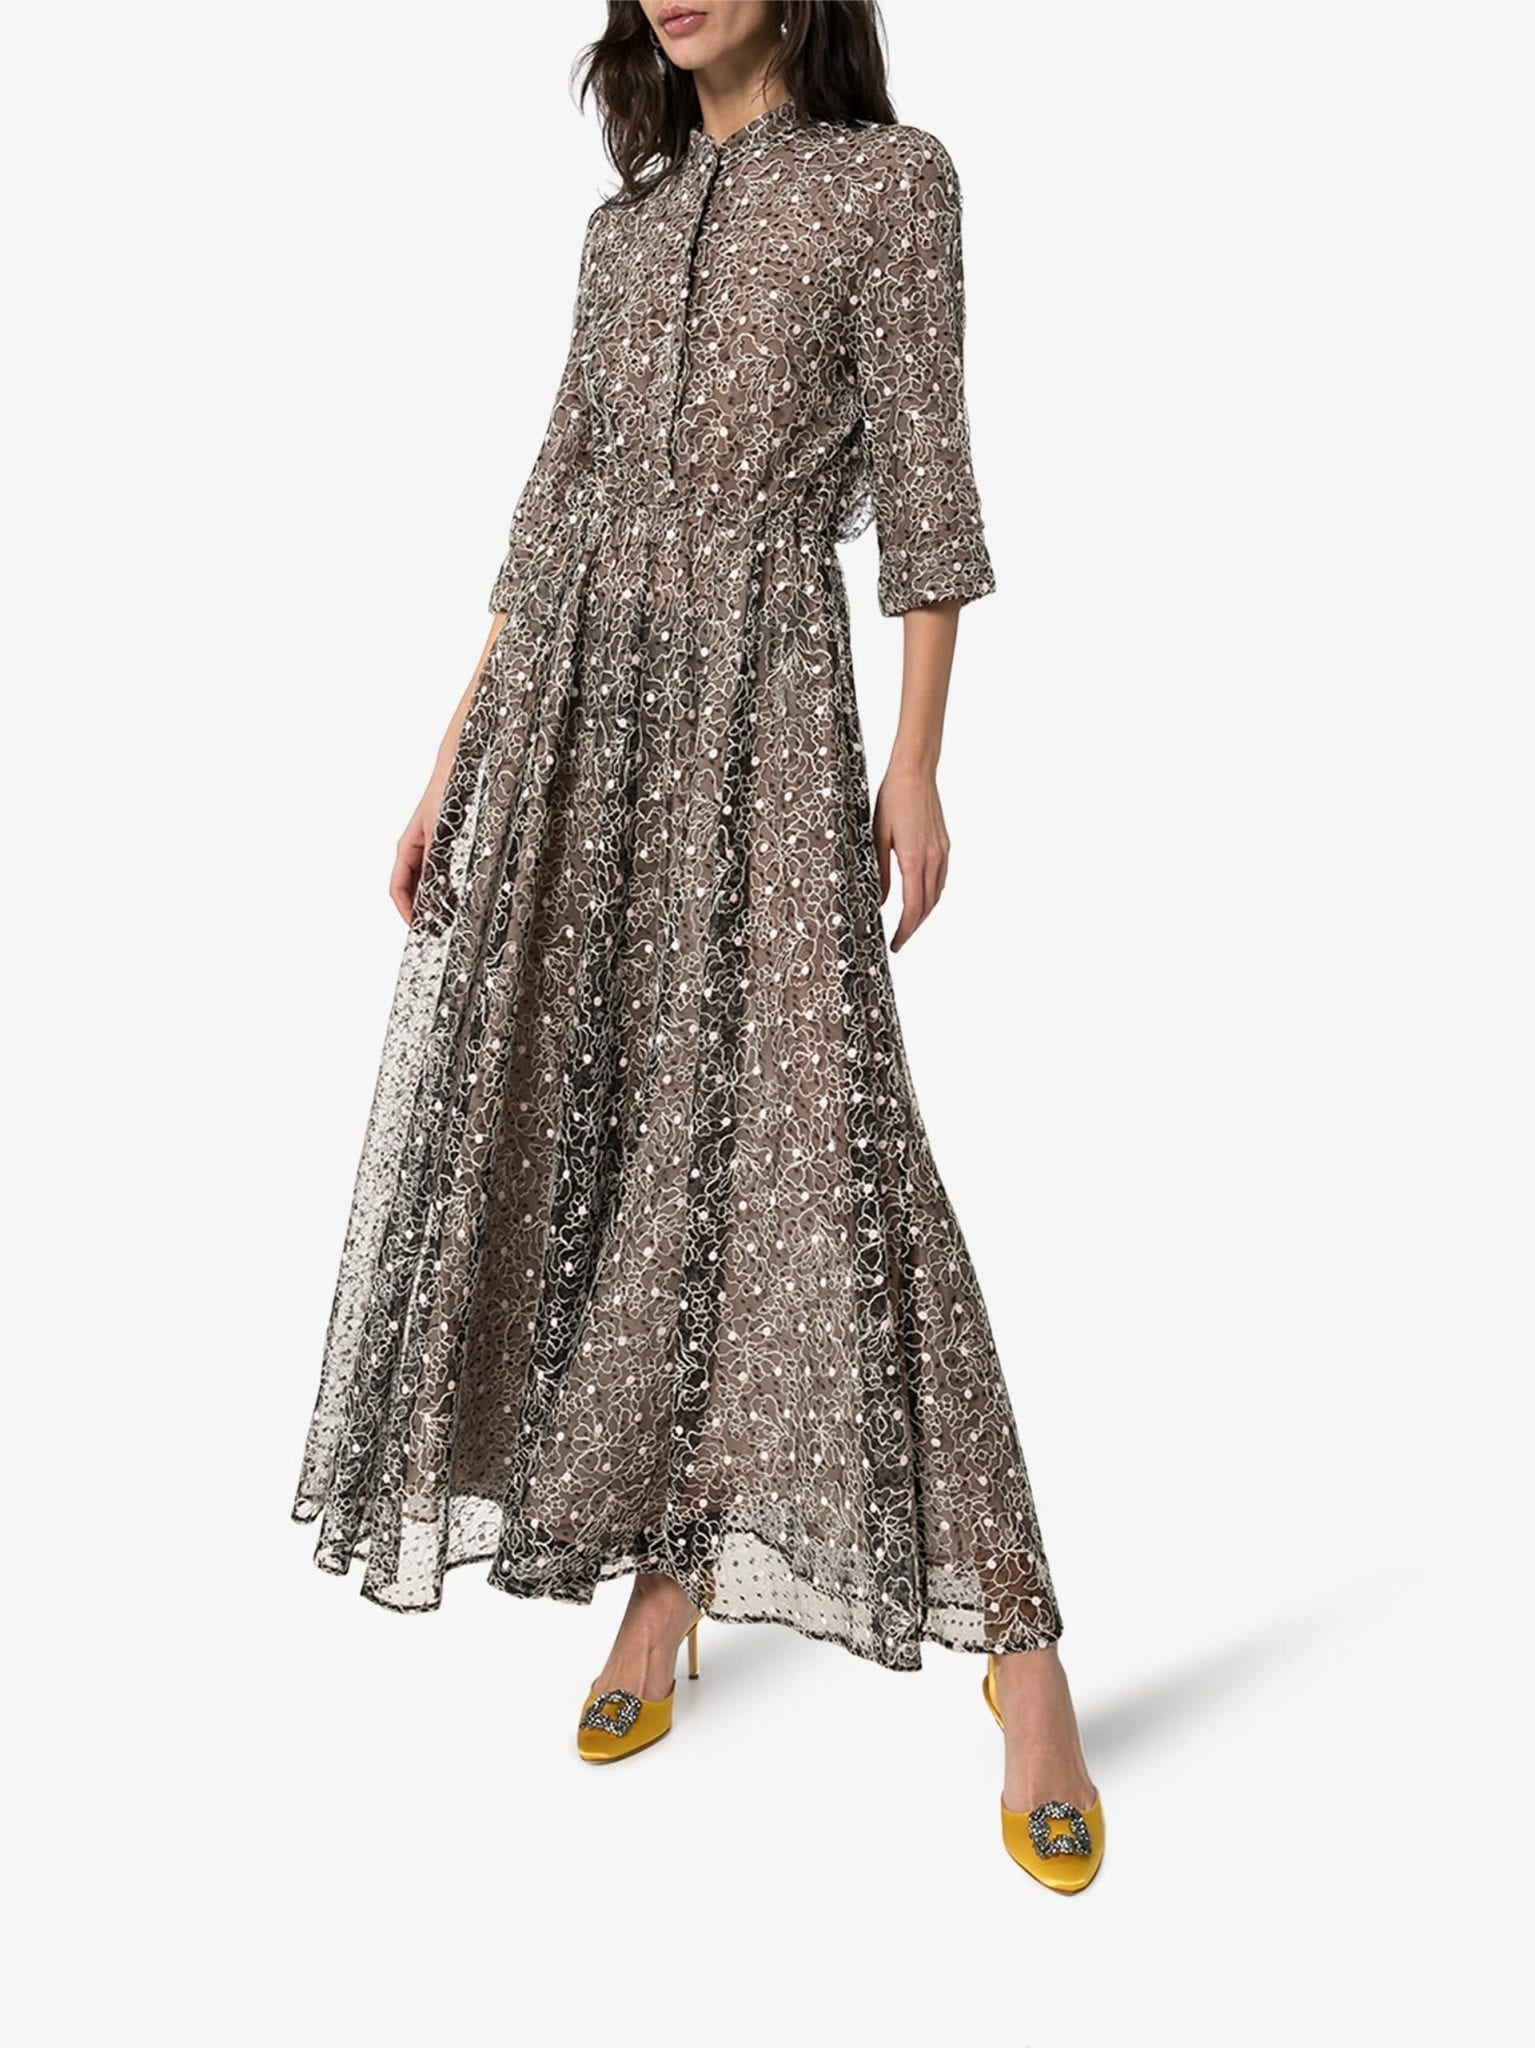 GIAMBATTISTA VALLI Floral Lace Maxi Dress